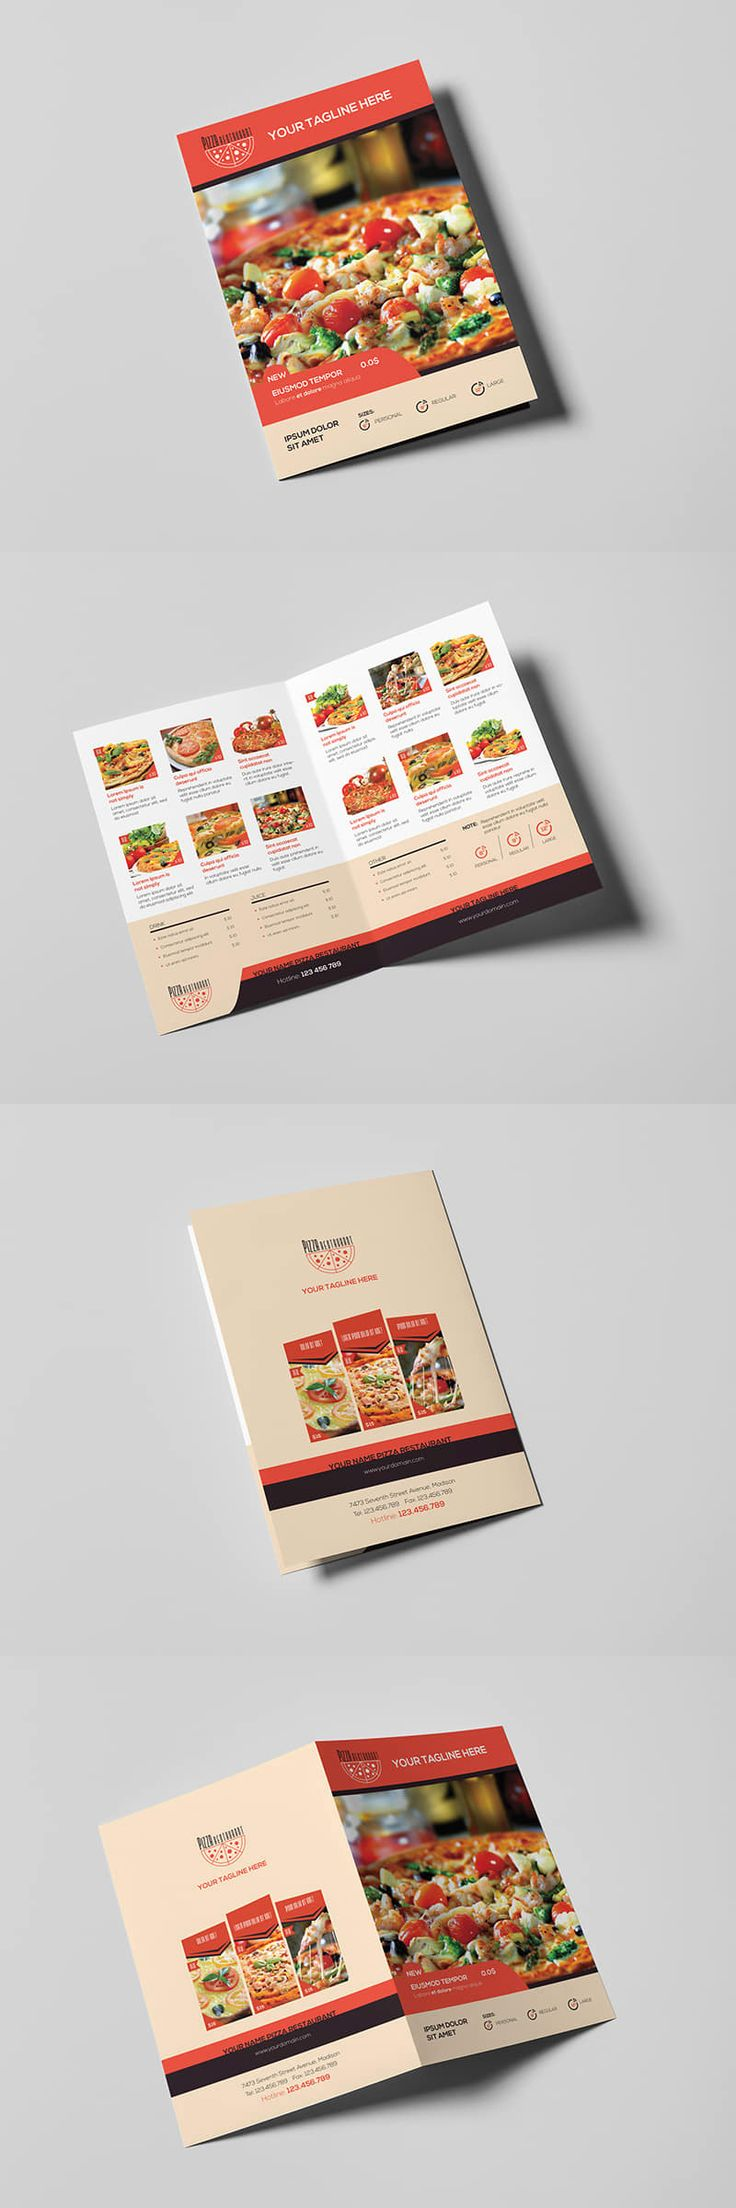 Pizza Restaurant - Menu Template PSD